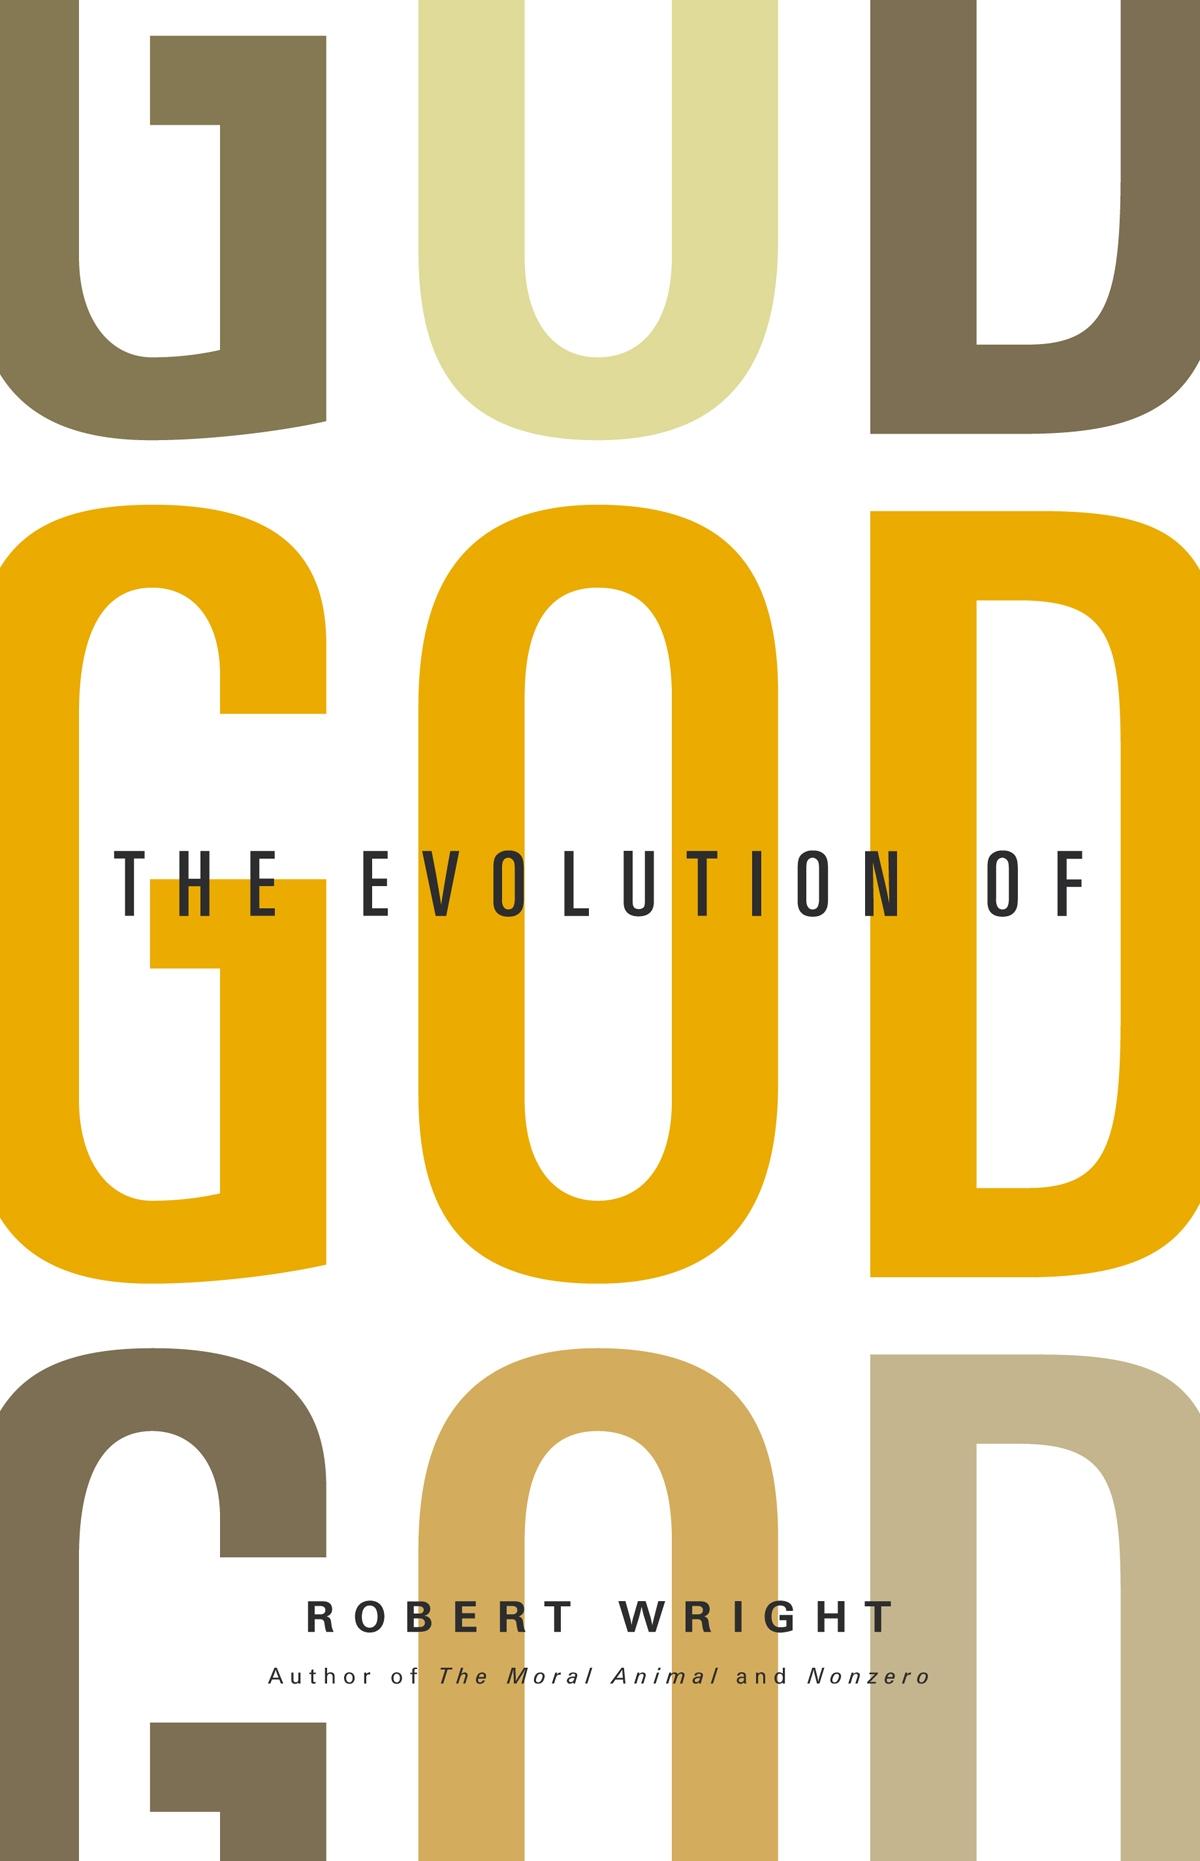 Amazon.com: Customer reviews: The Evolution of God